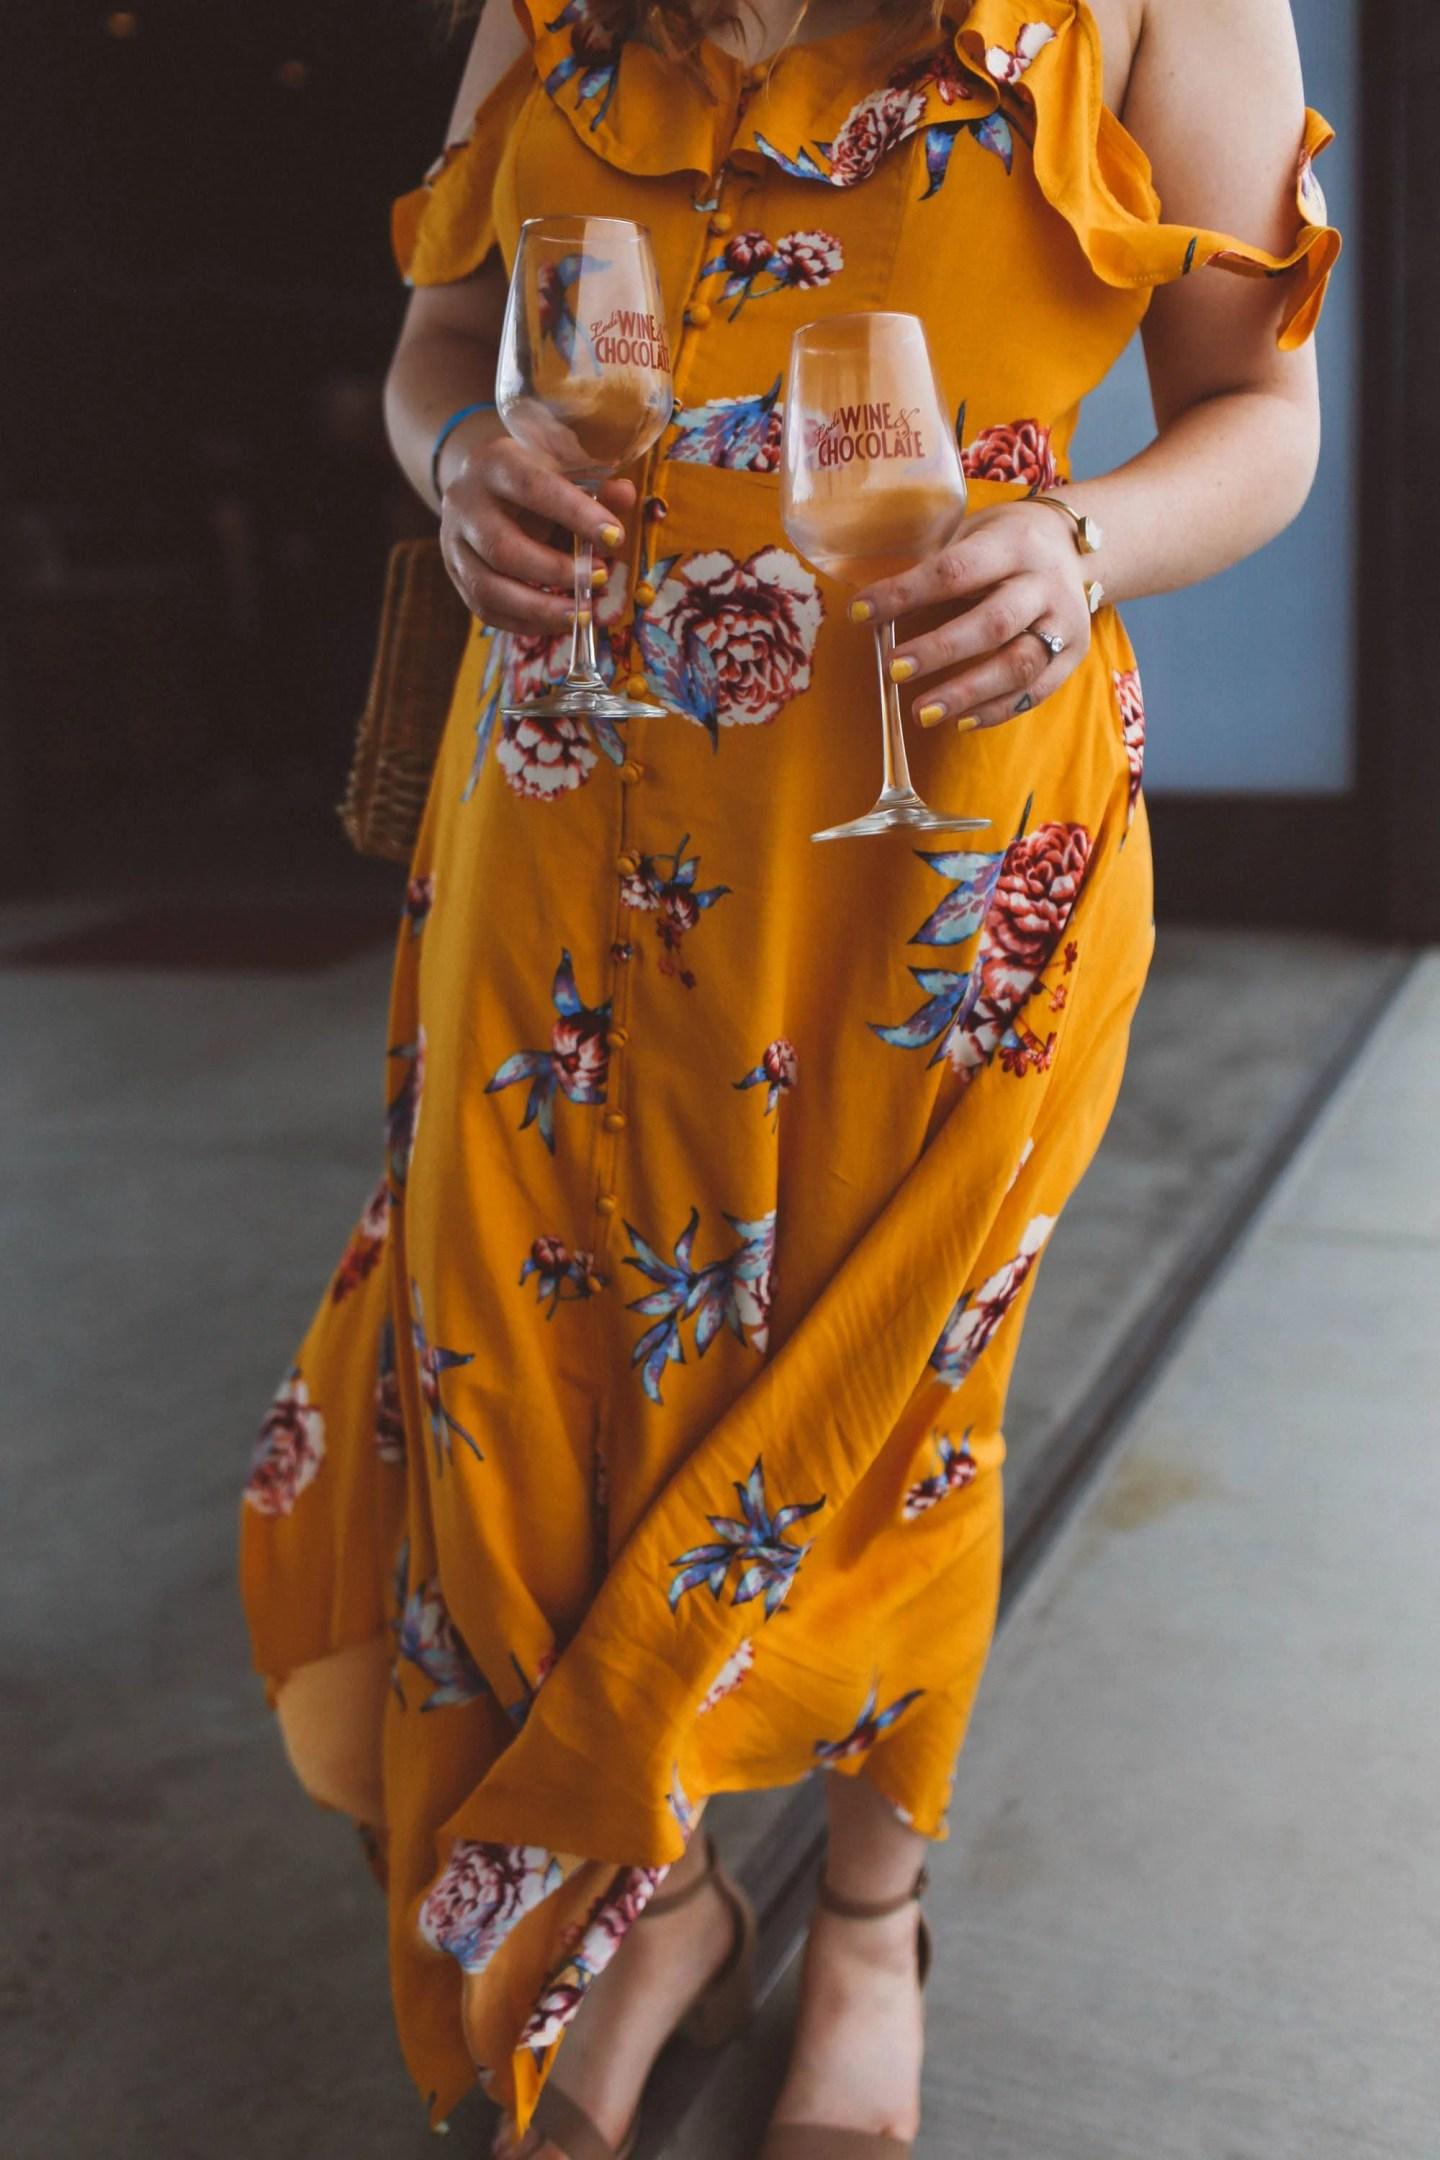 wine tasting dress idea